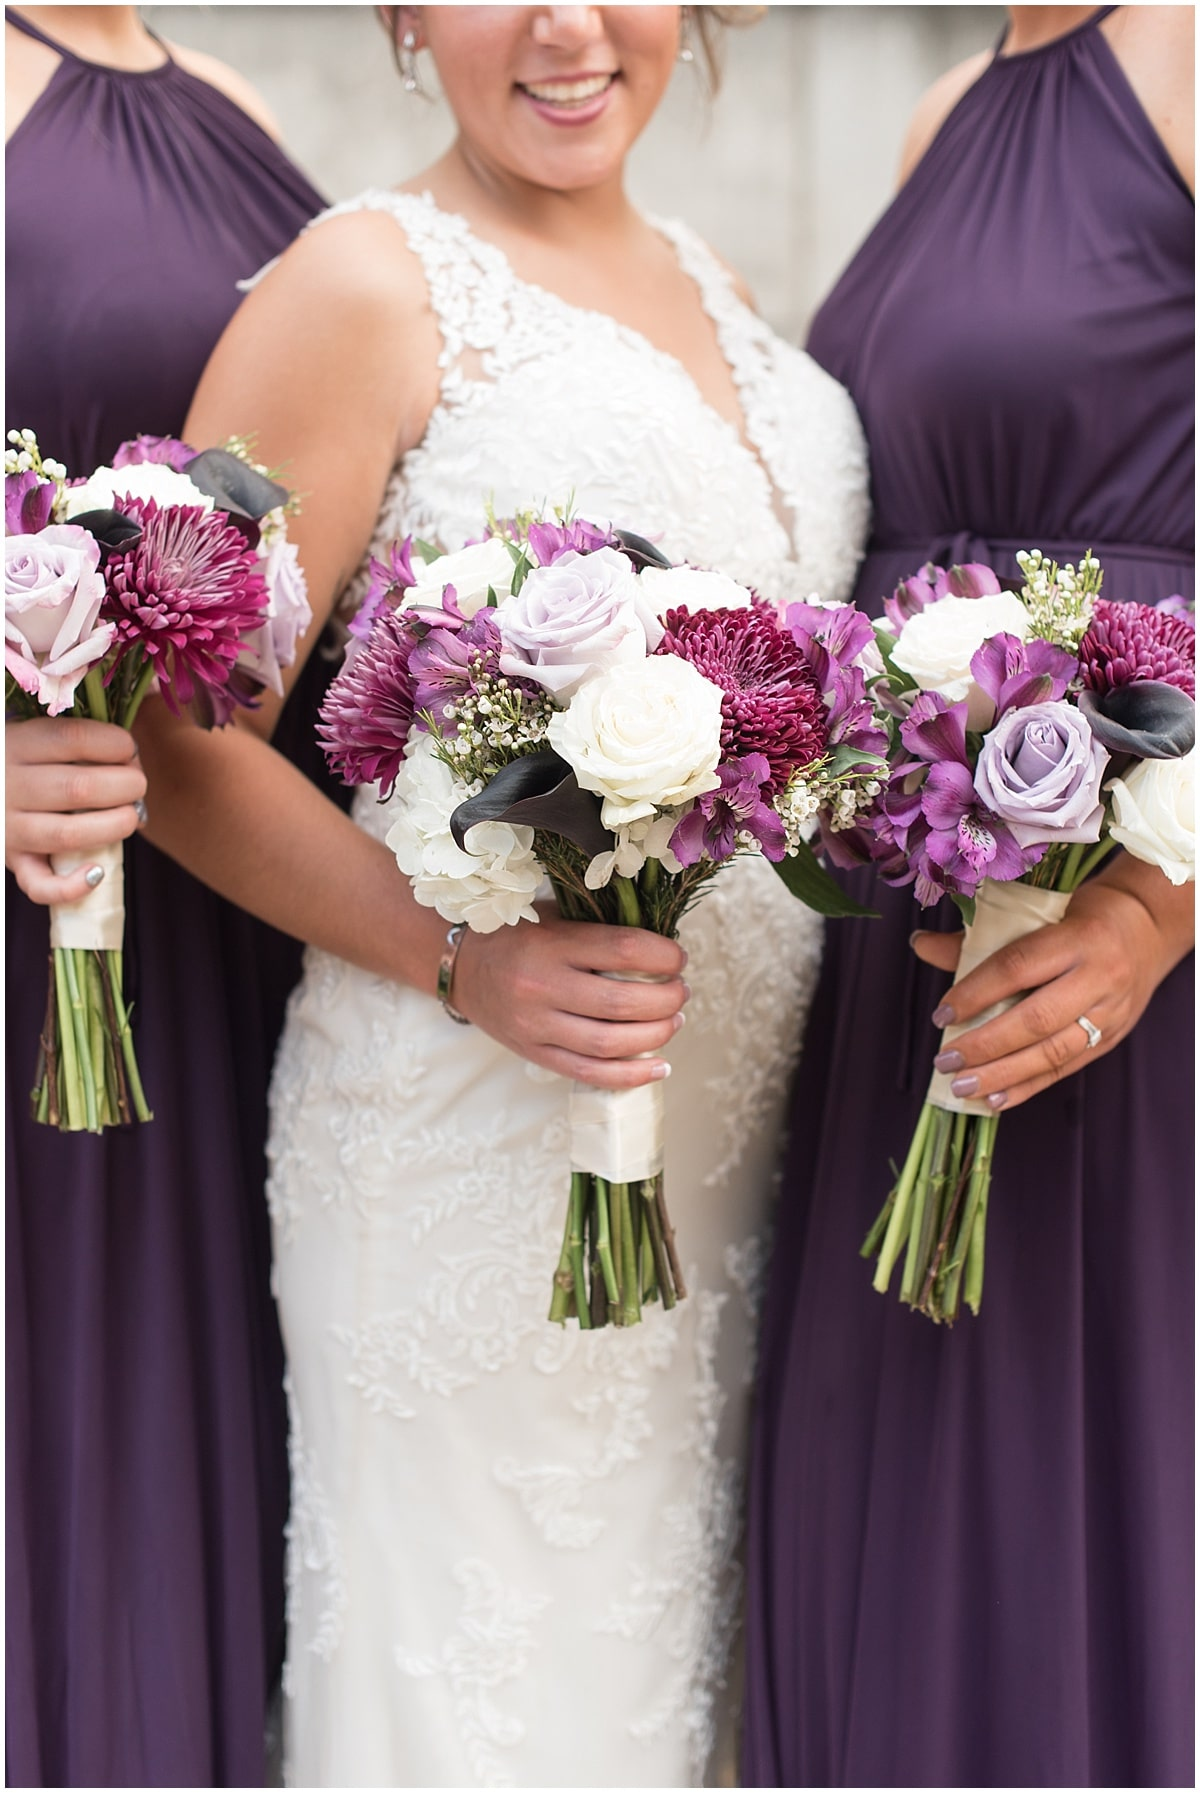 Seward Wedding/ Wedding at the Lahr Atrium in Lafayette, Indiana 64.jpg